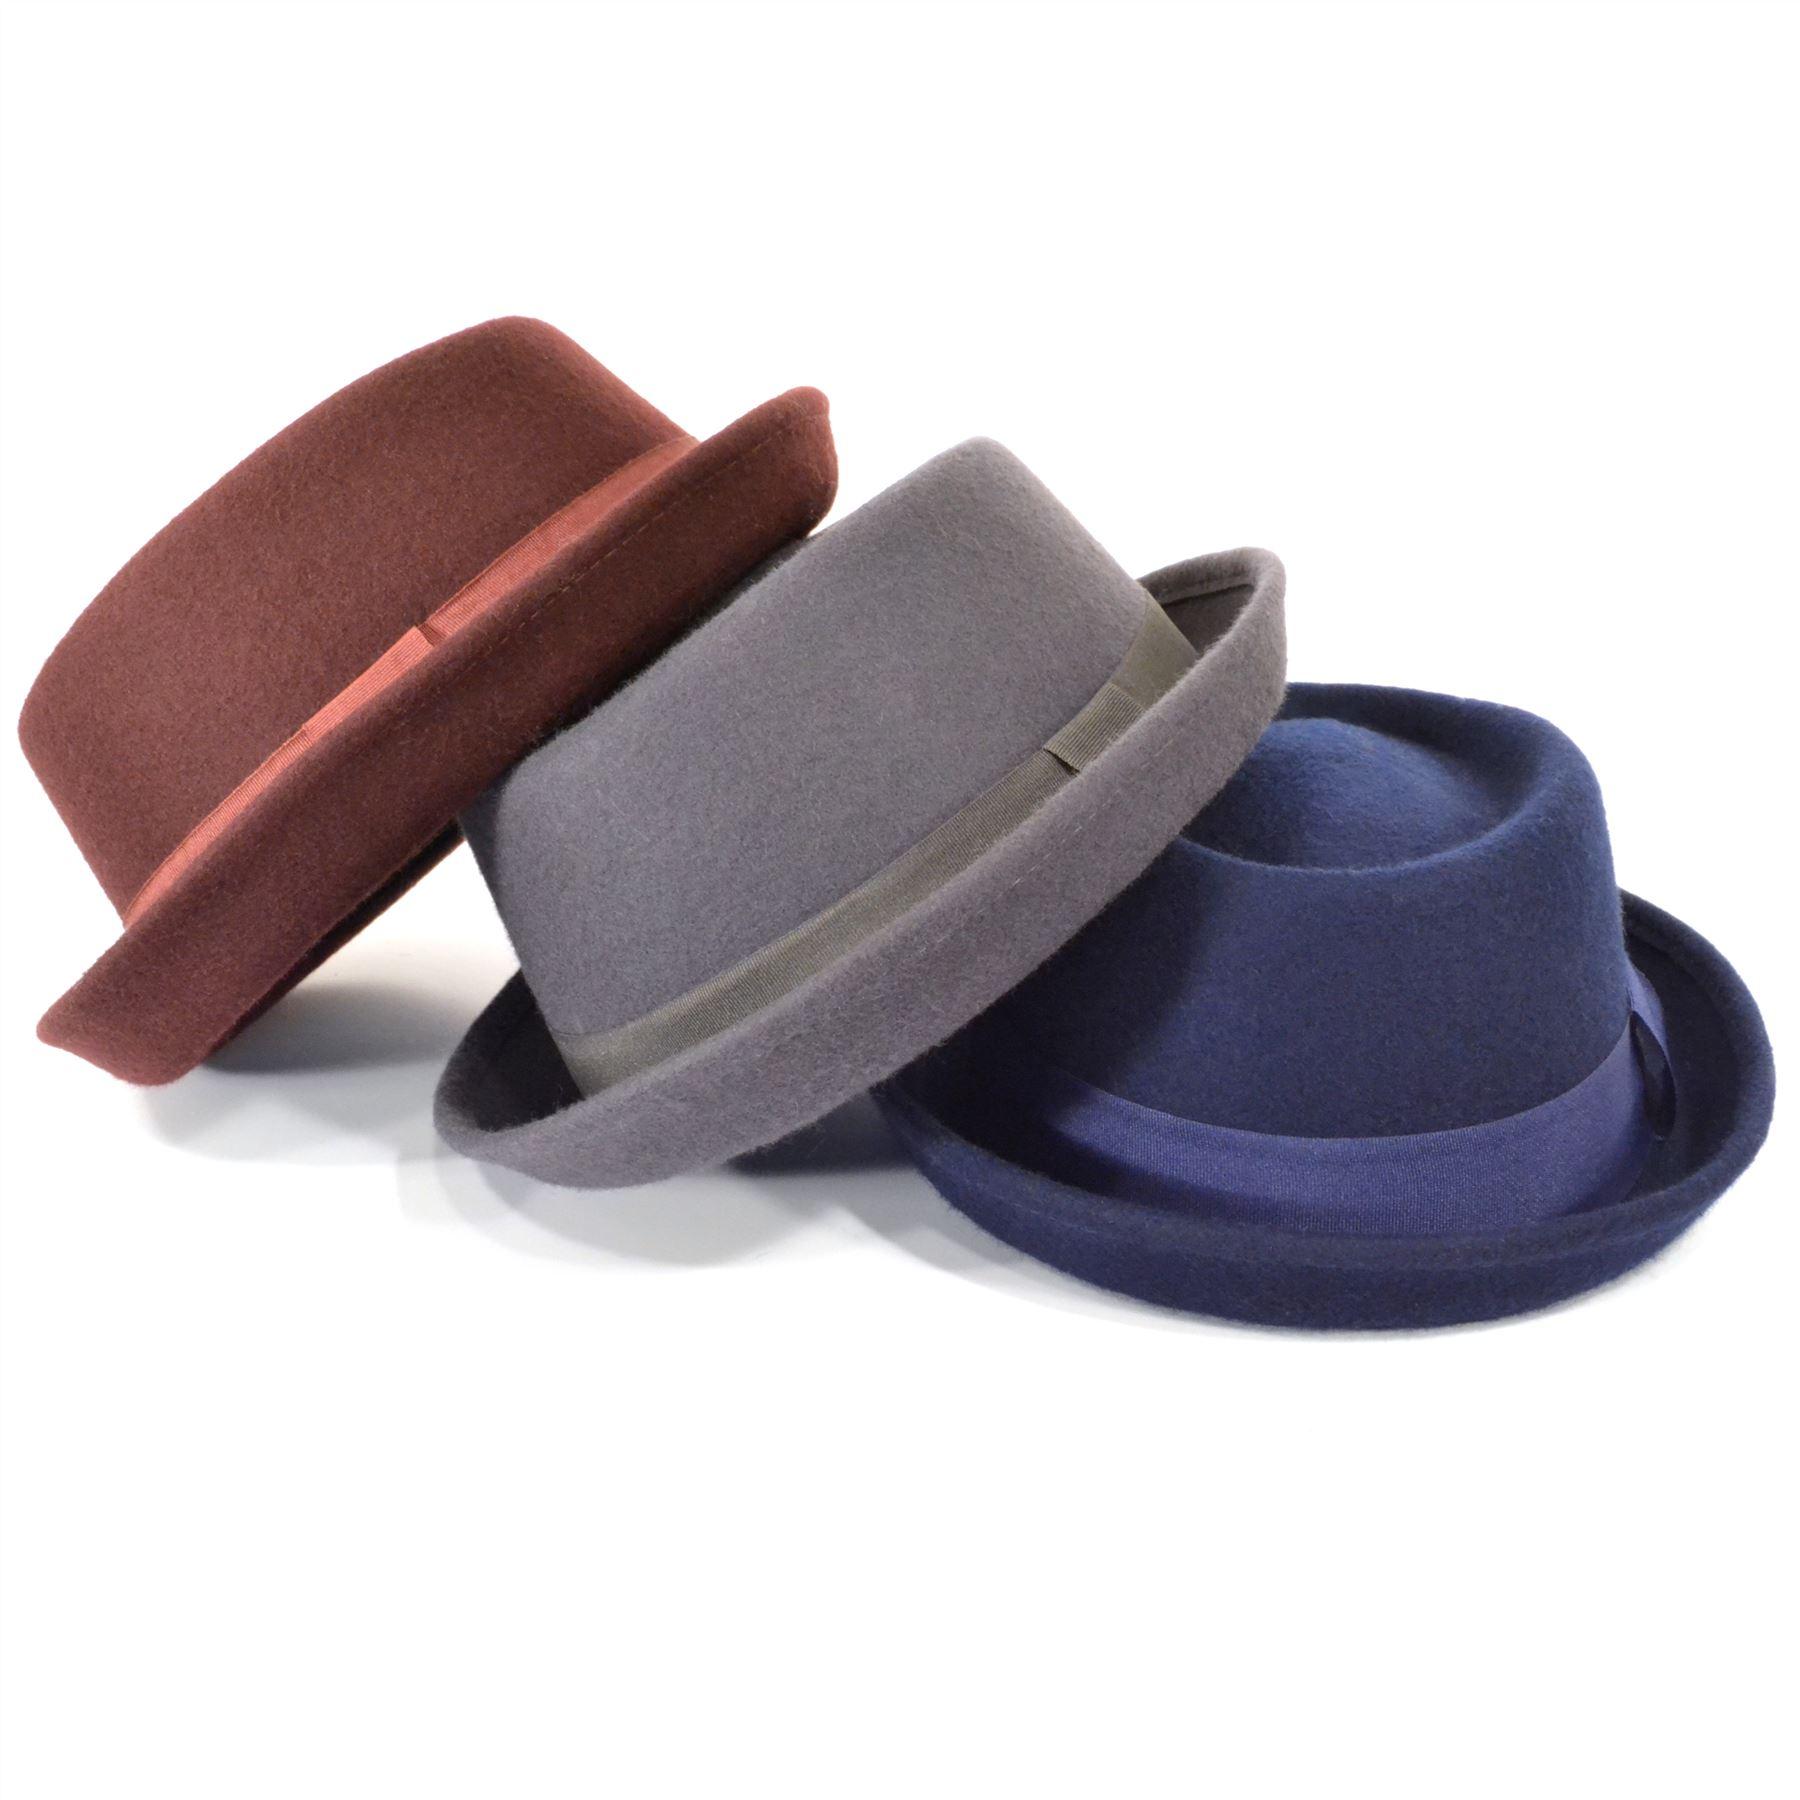 f705e0349eaa0 Details about Porkpie Pork Pie Hat Trilby Wool Felt Unisex Fedora Jazz  unisex BLUE GREY MAROON